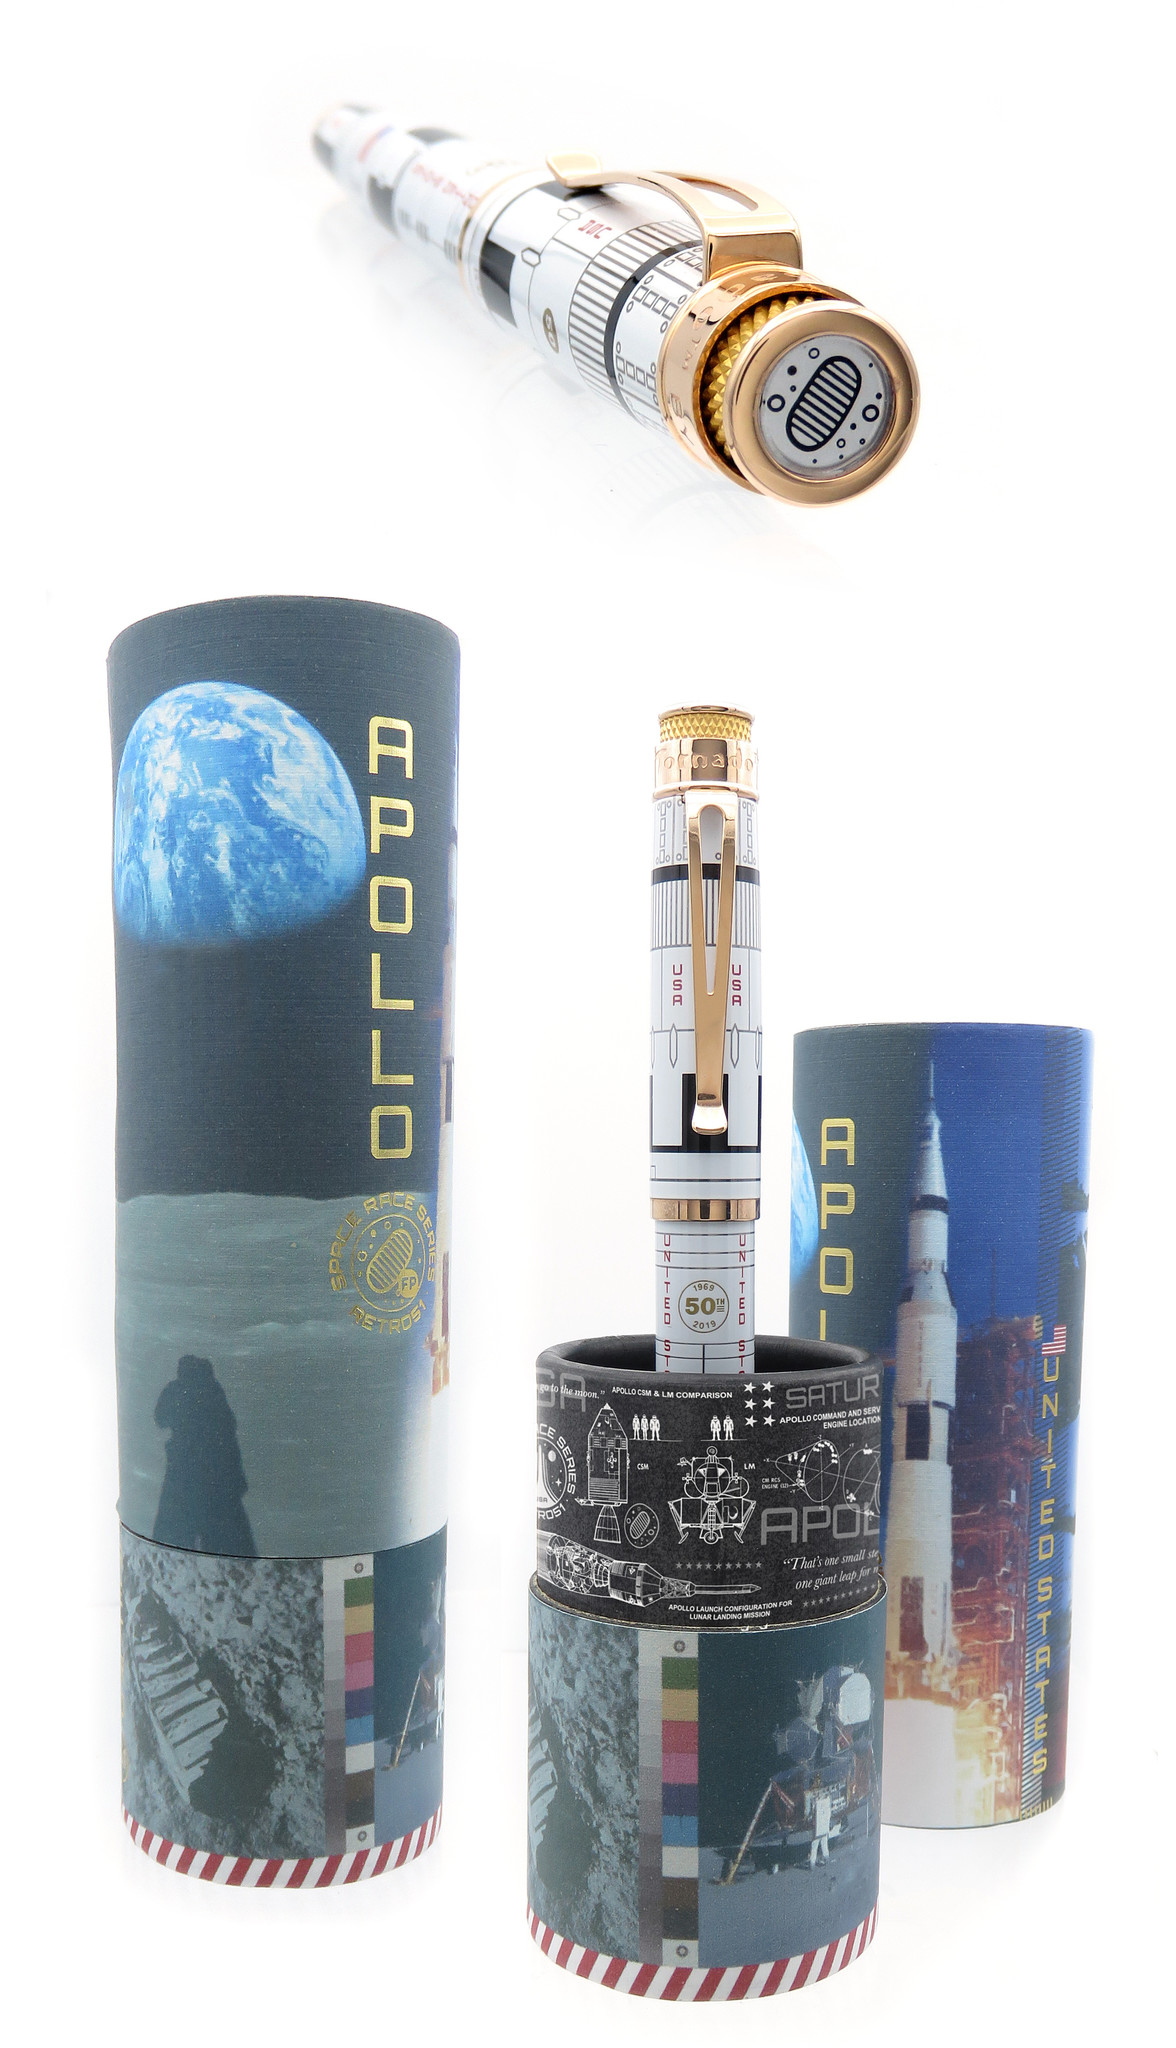 Retro 51 Apollo Fountain Pen